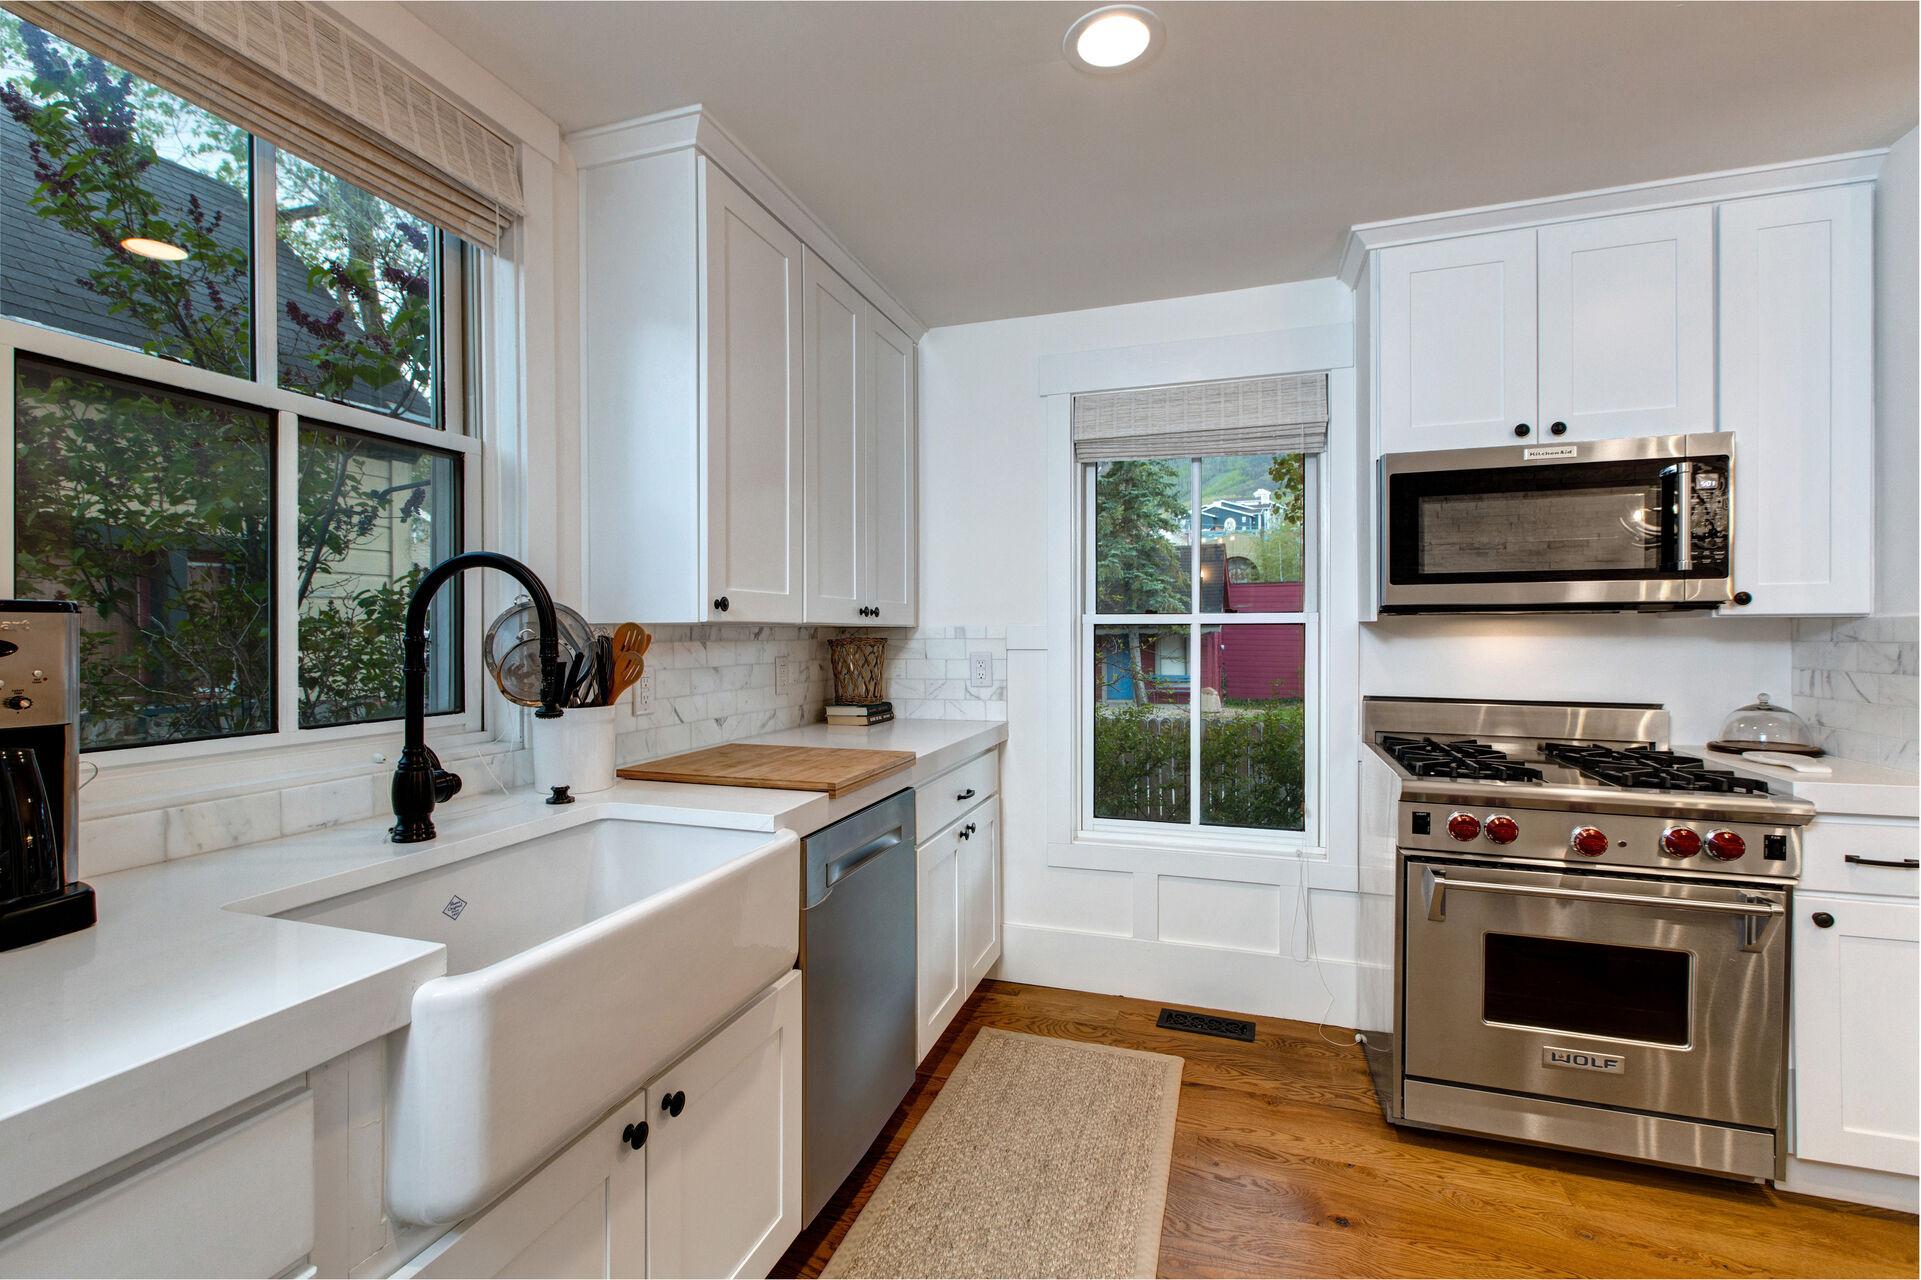 Hardwood Floors Extend into the Kitchen